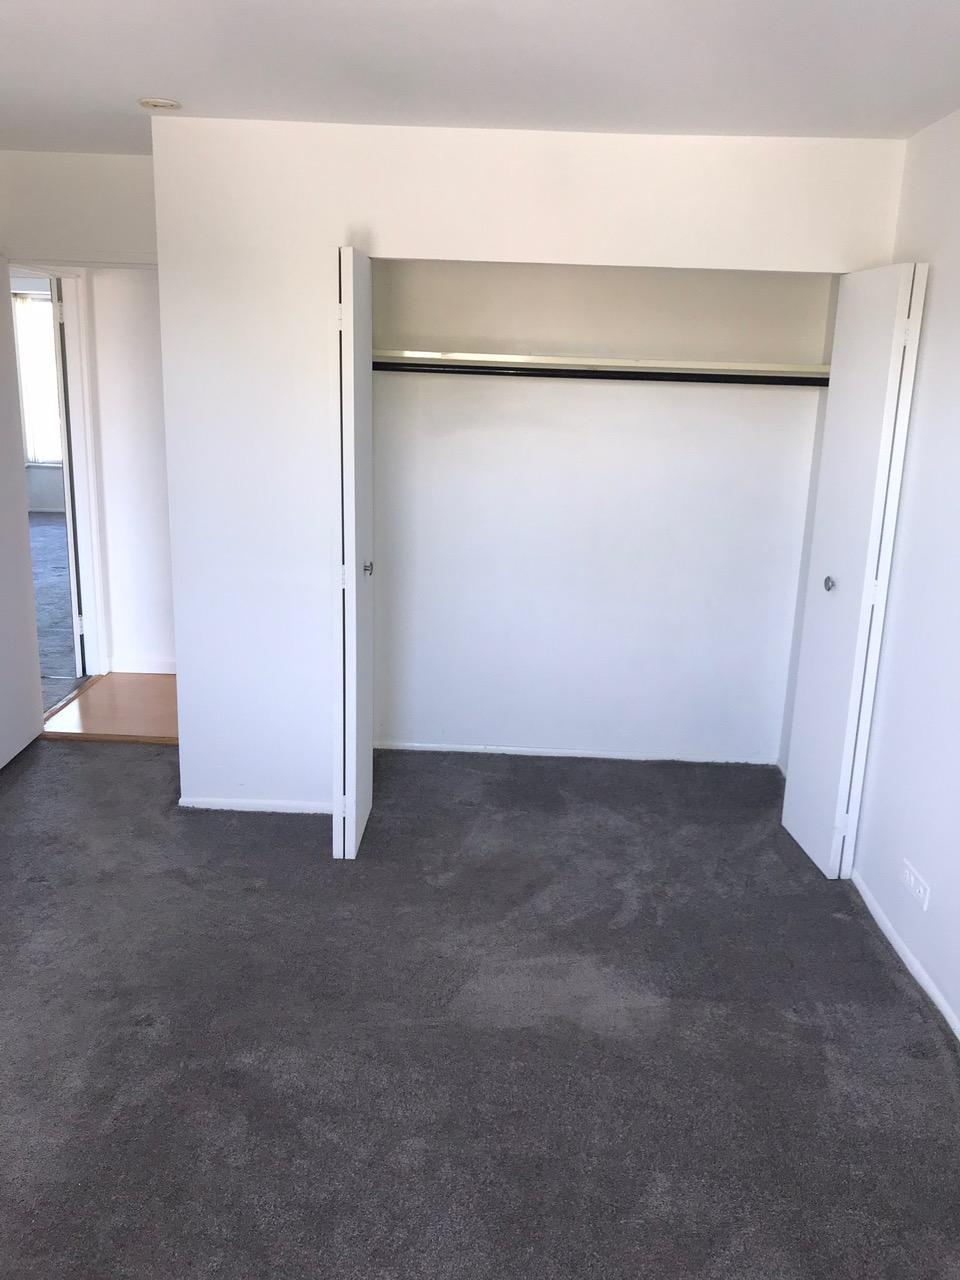 Closet - Hinton Real Estate Group